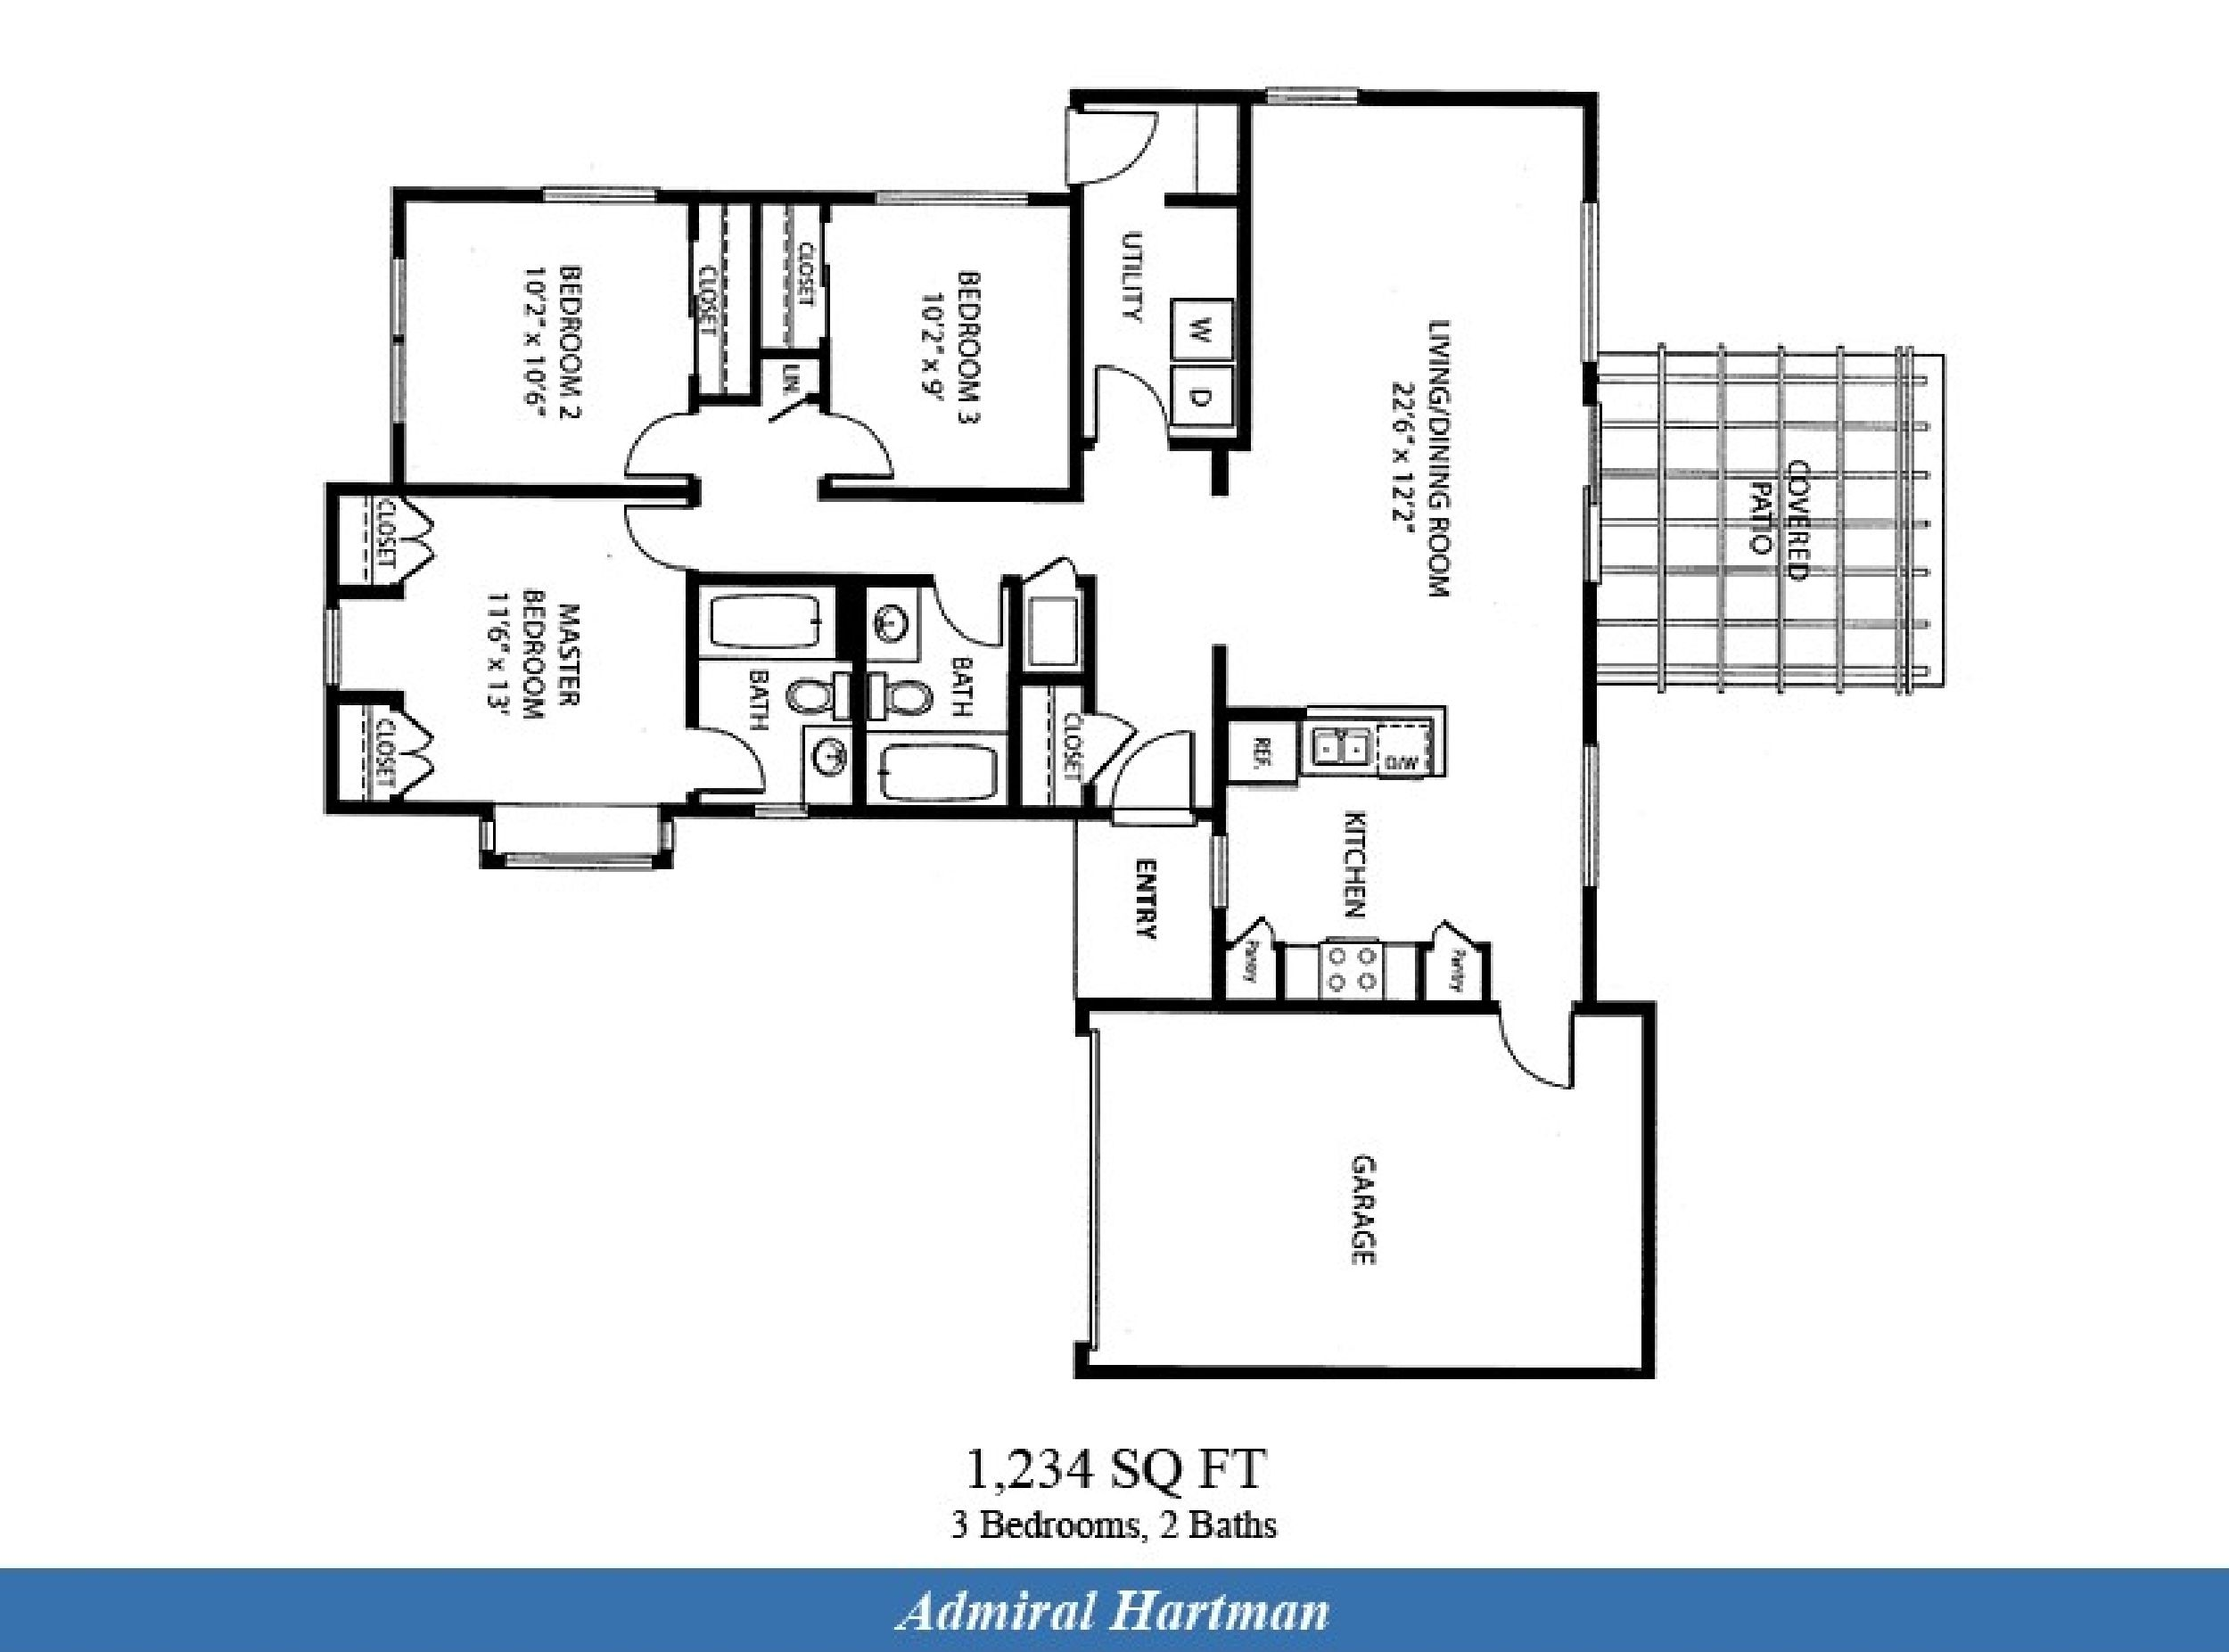 Home Floor Plans In San Diego